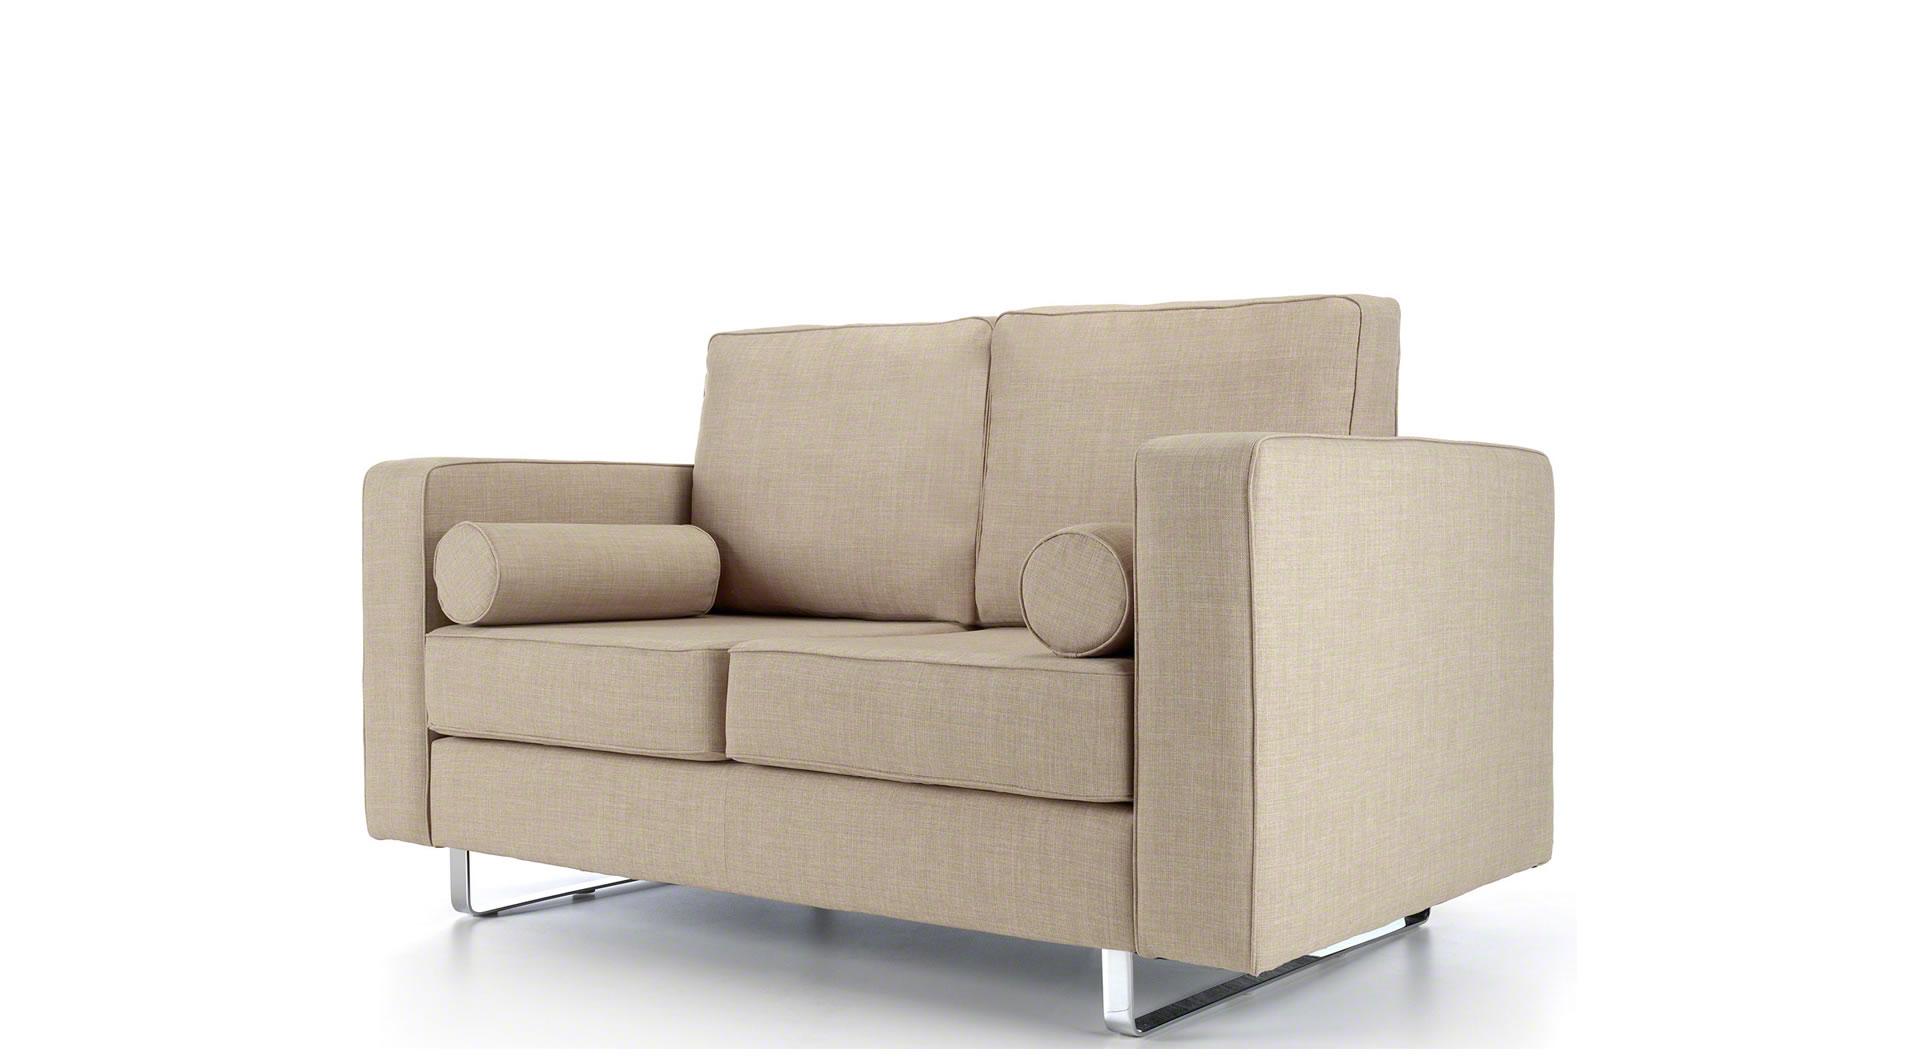 oatmeal sofa wayfair sofas canada eliza 2 seater mysmallspace